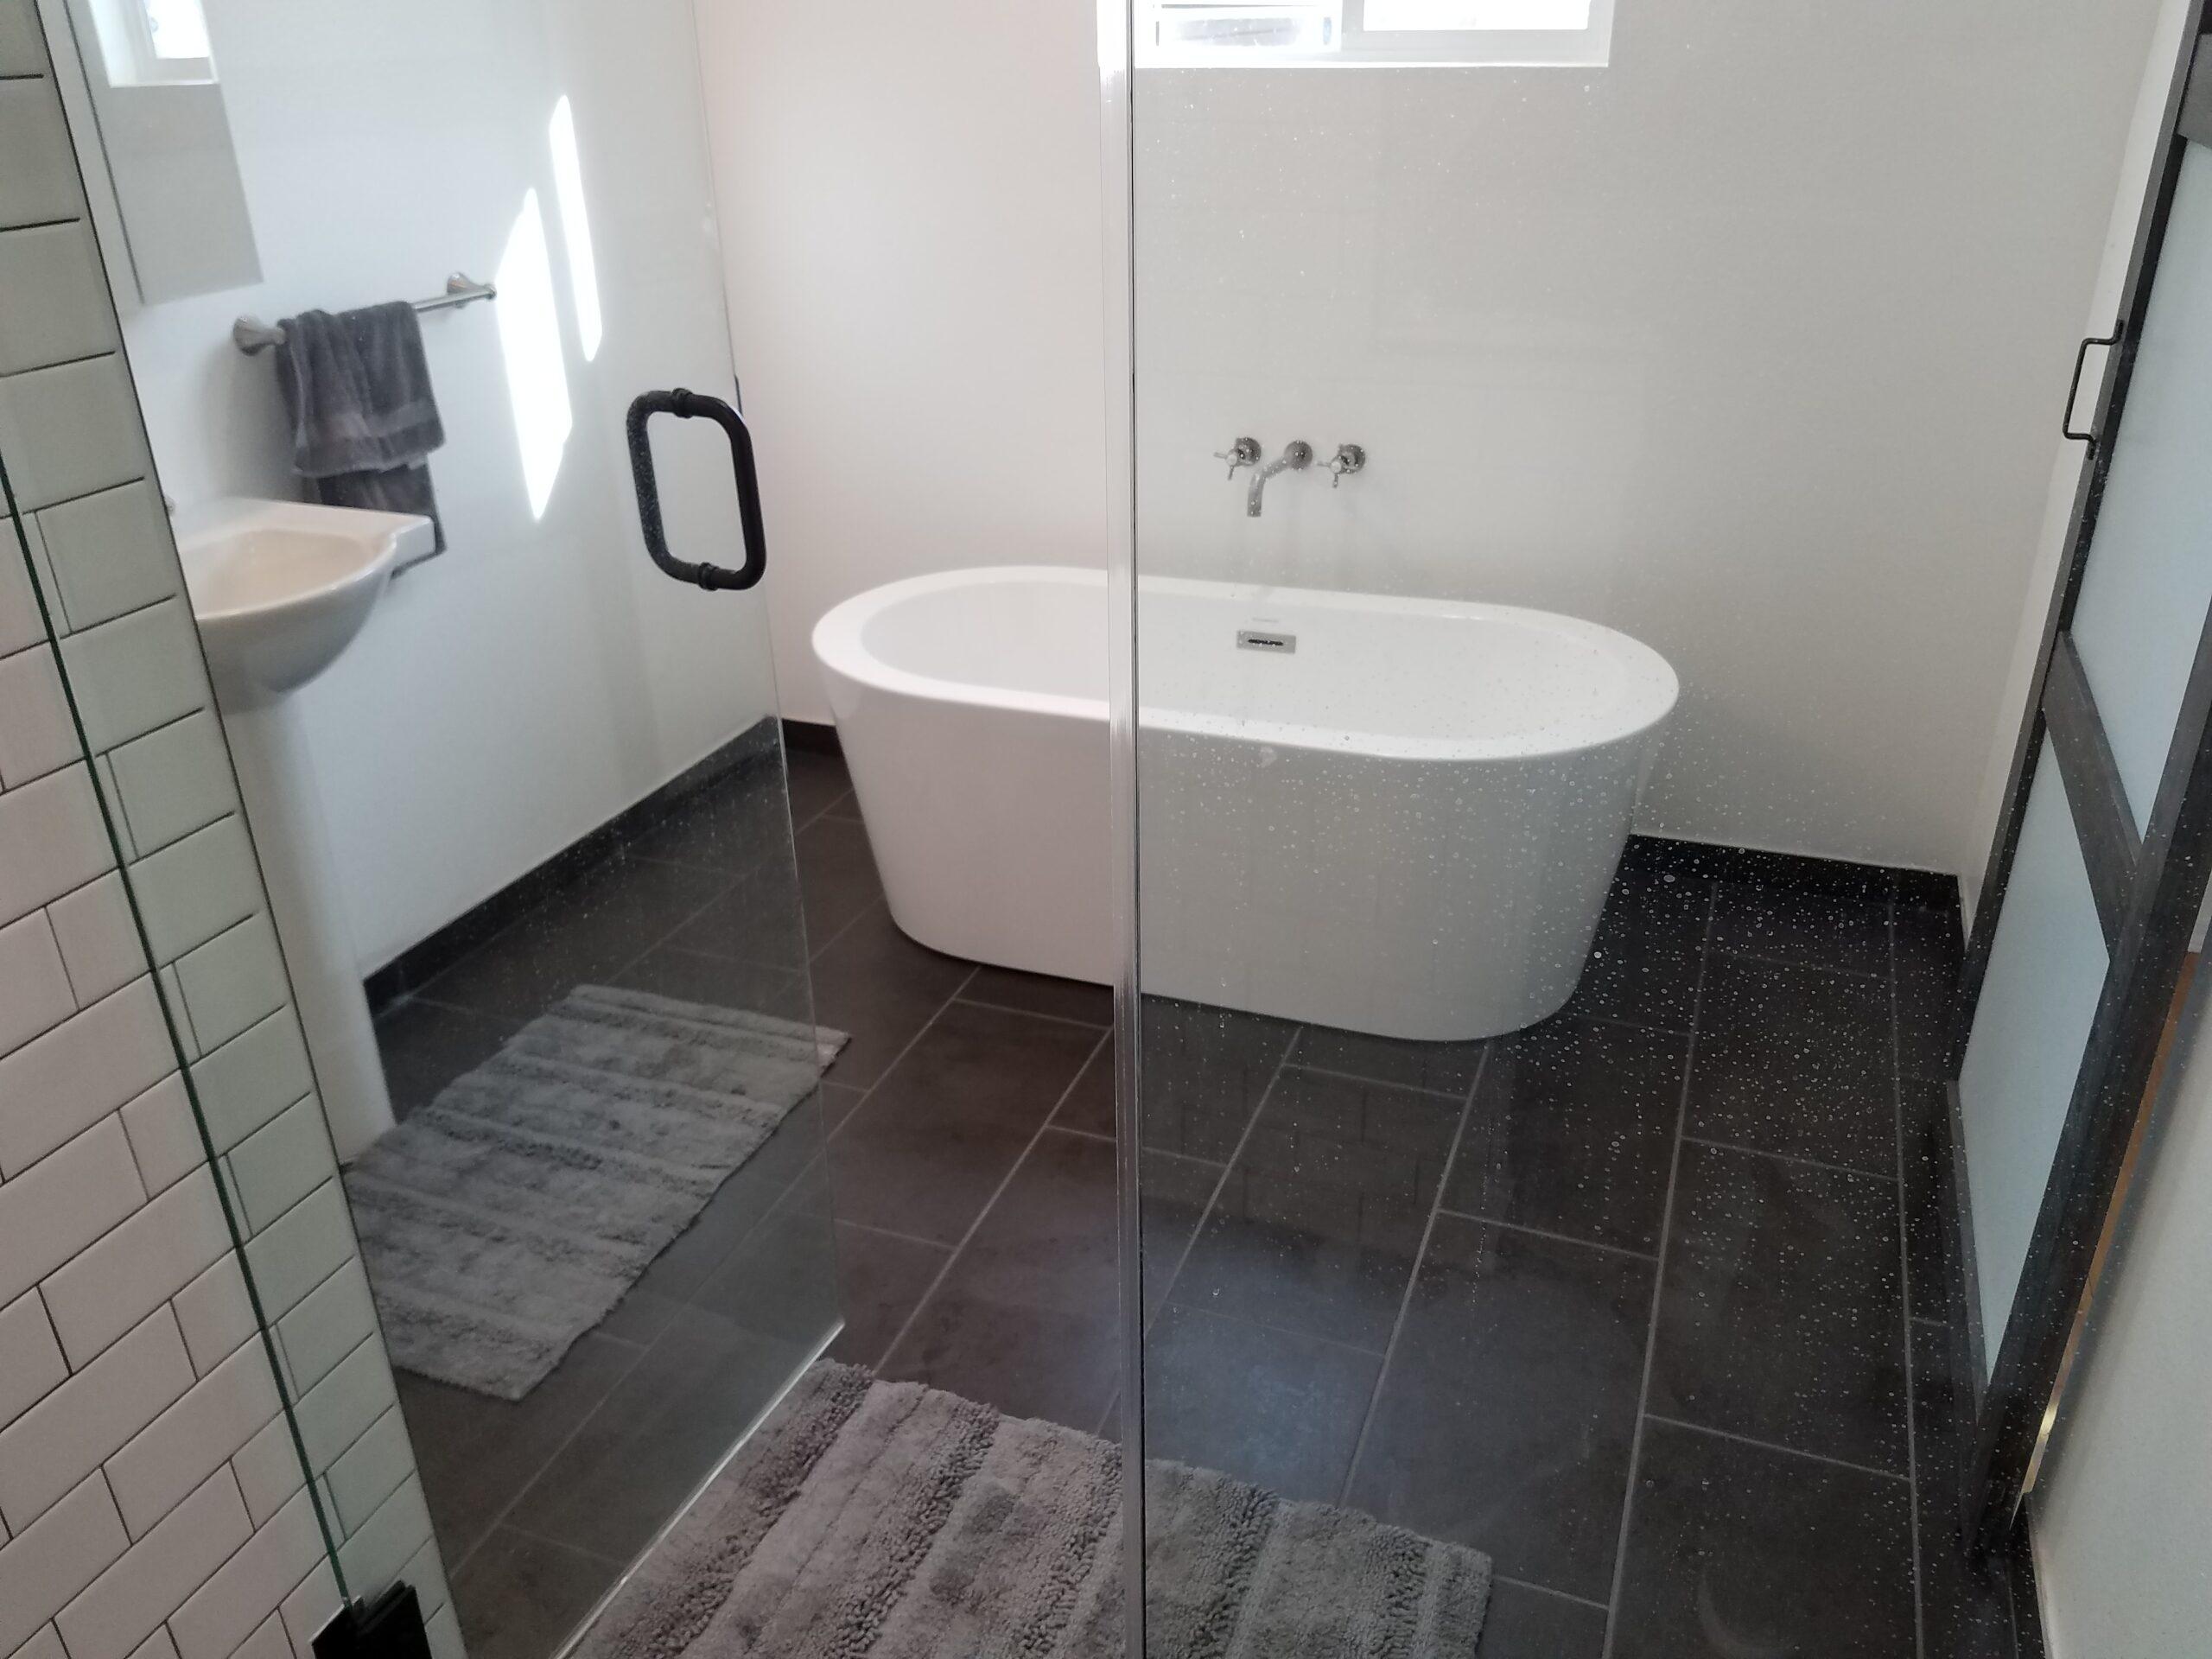 image showing bathroom conversion